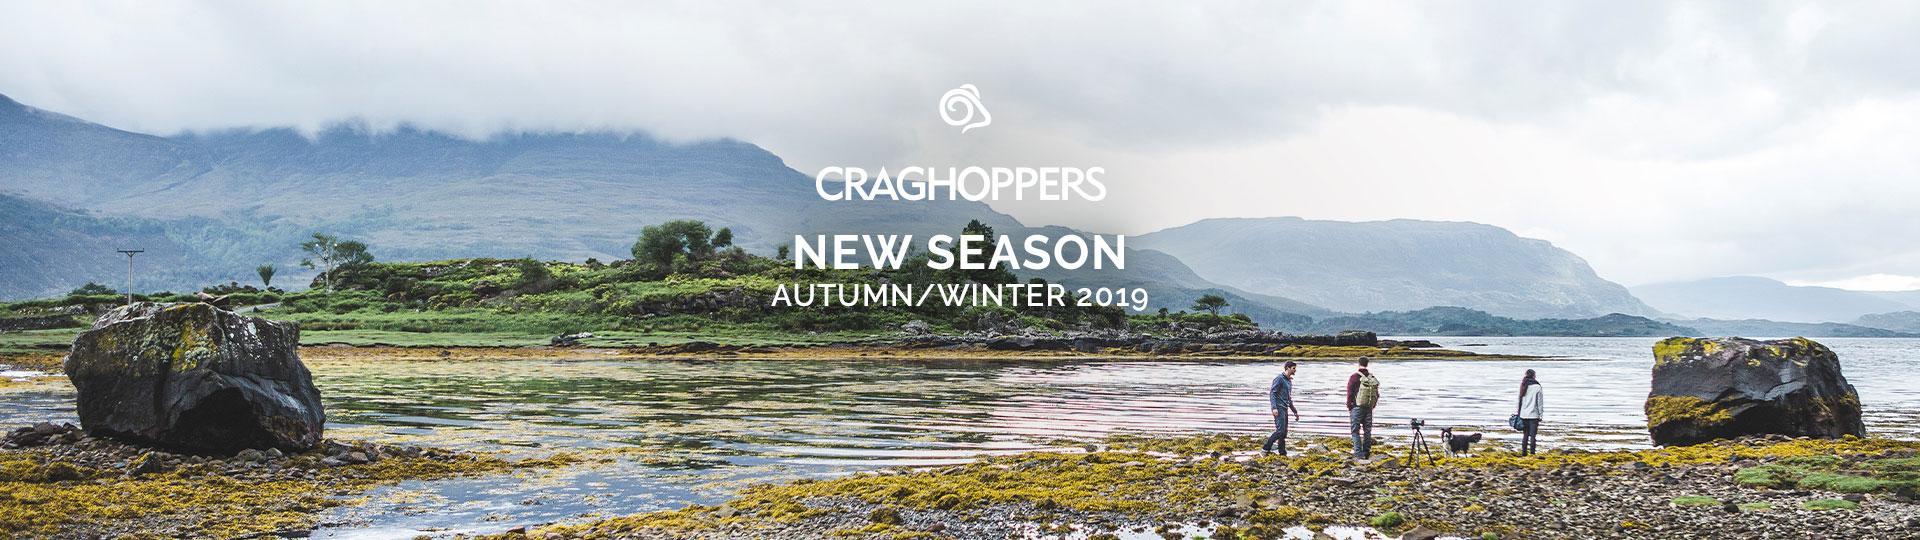 Craghoppers New Season